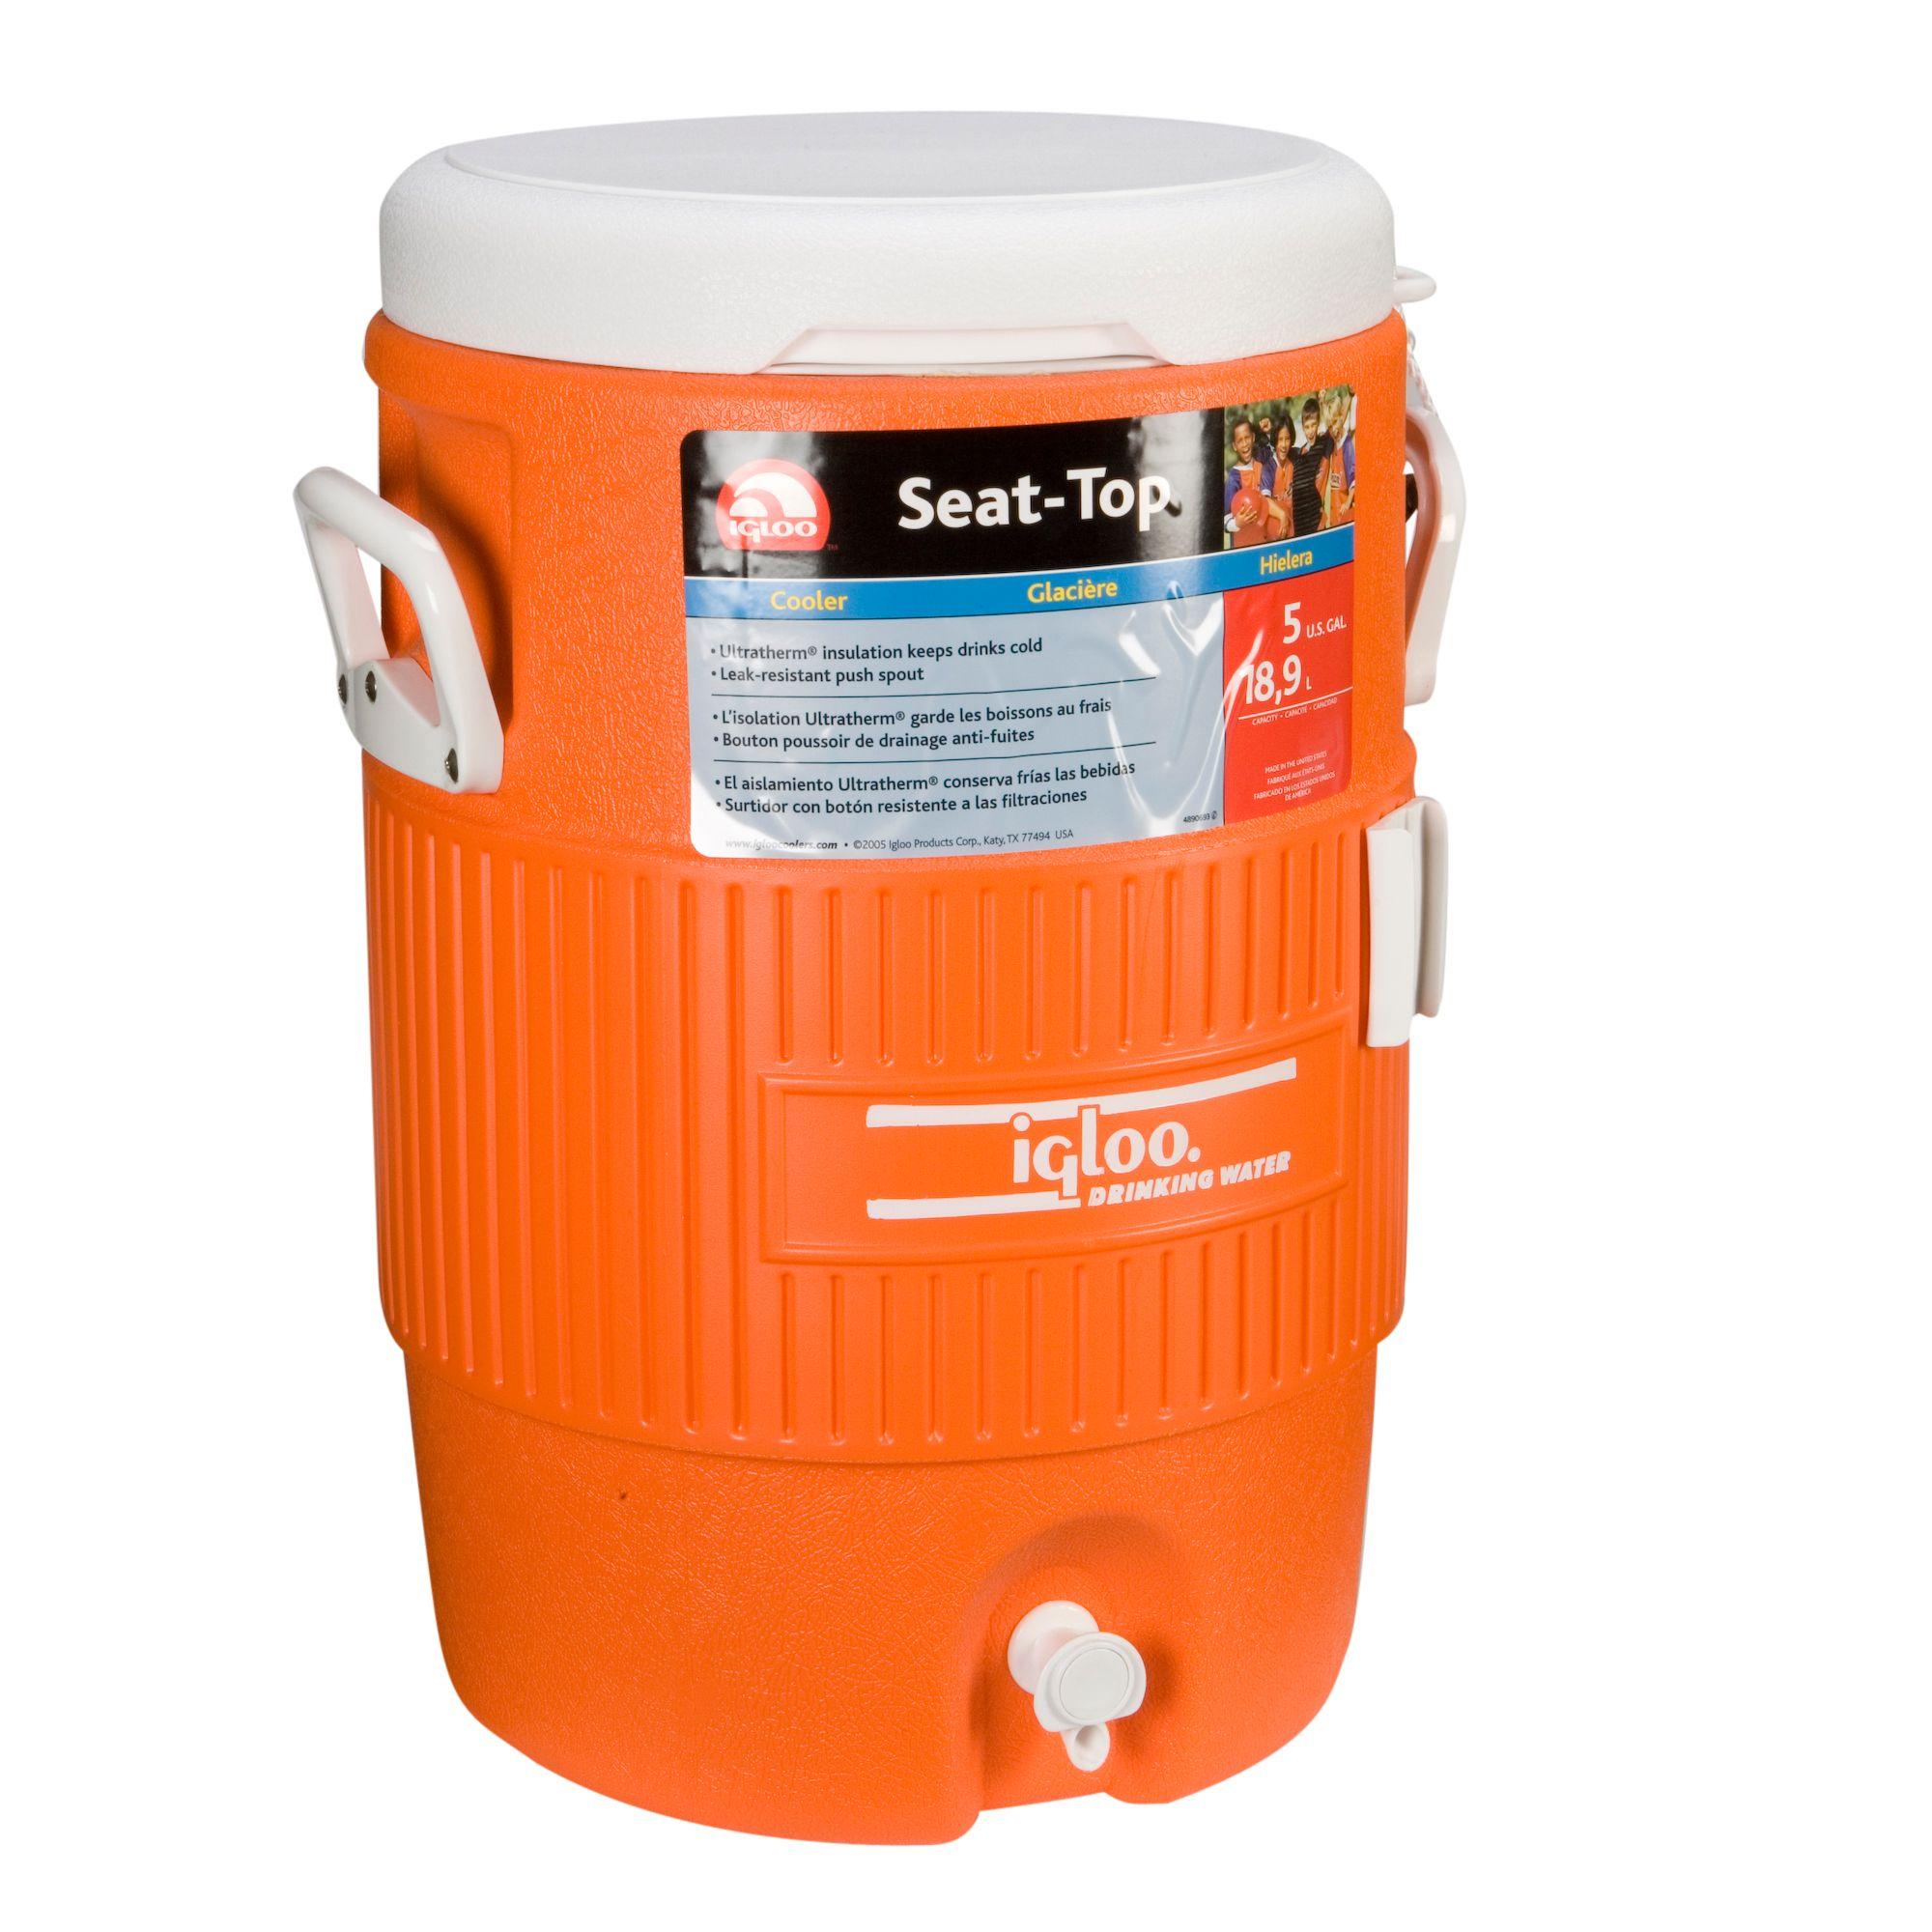 Igloo 5 Gallon Seat Top Cooler